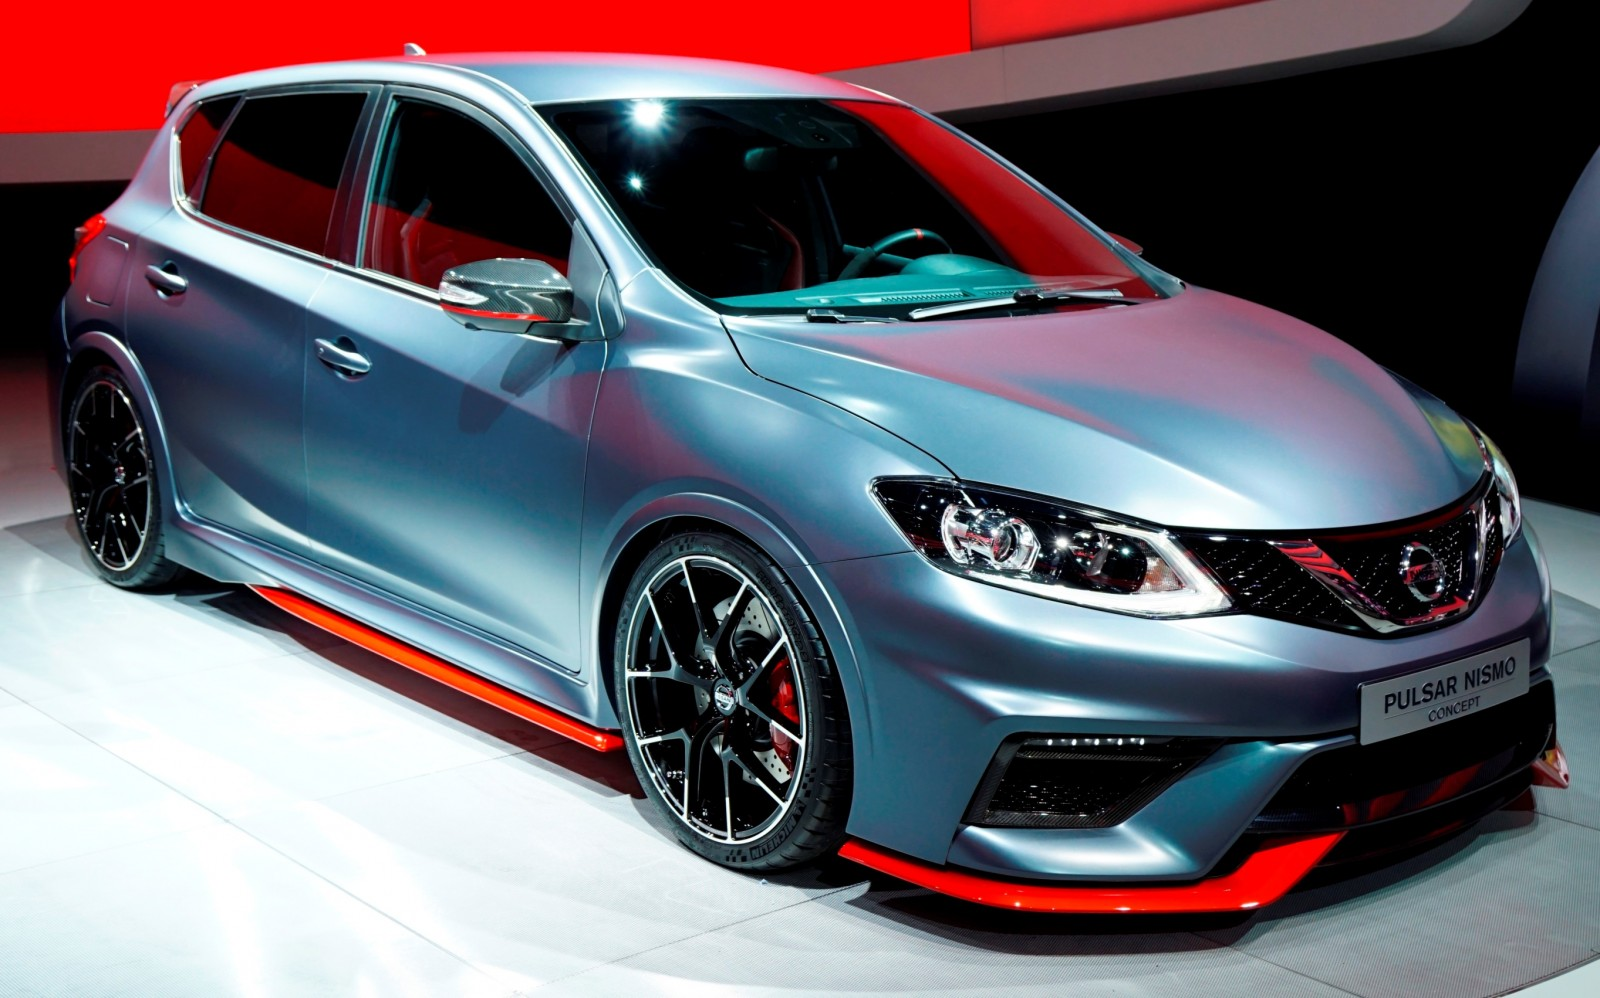 Nissan Pulsar NISMO Concept 9